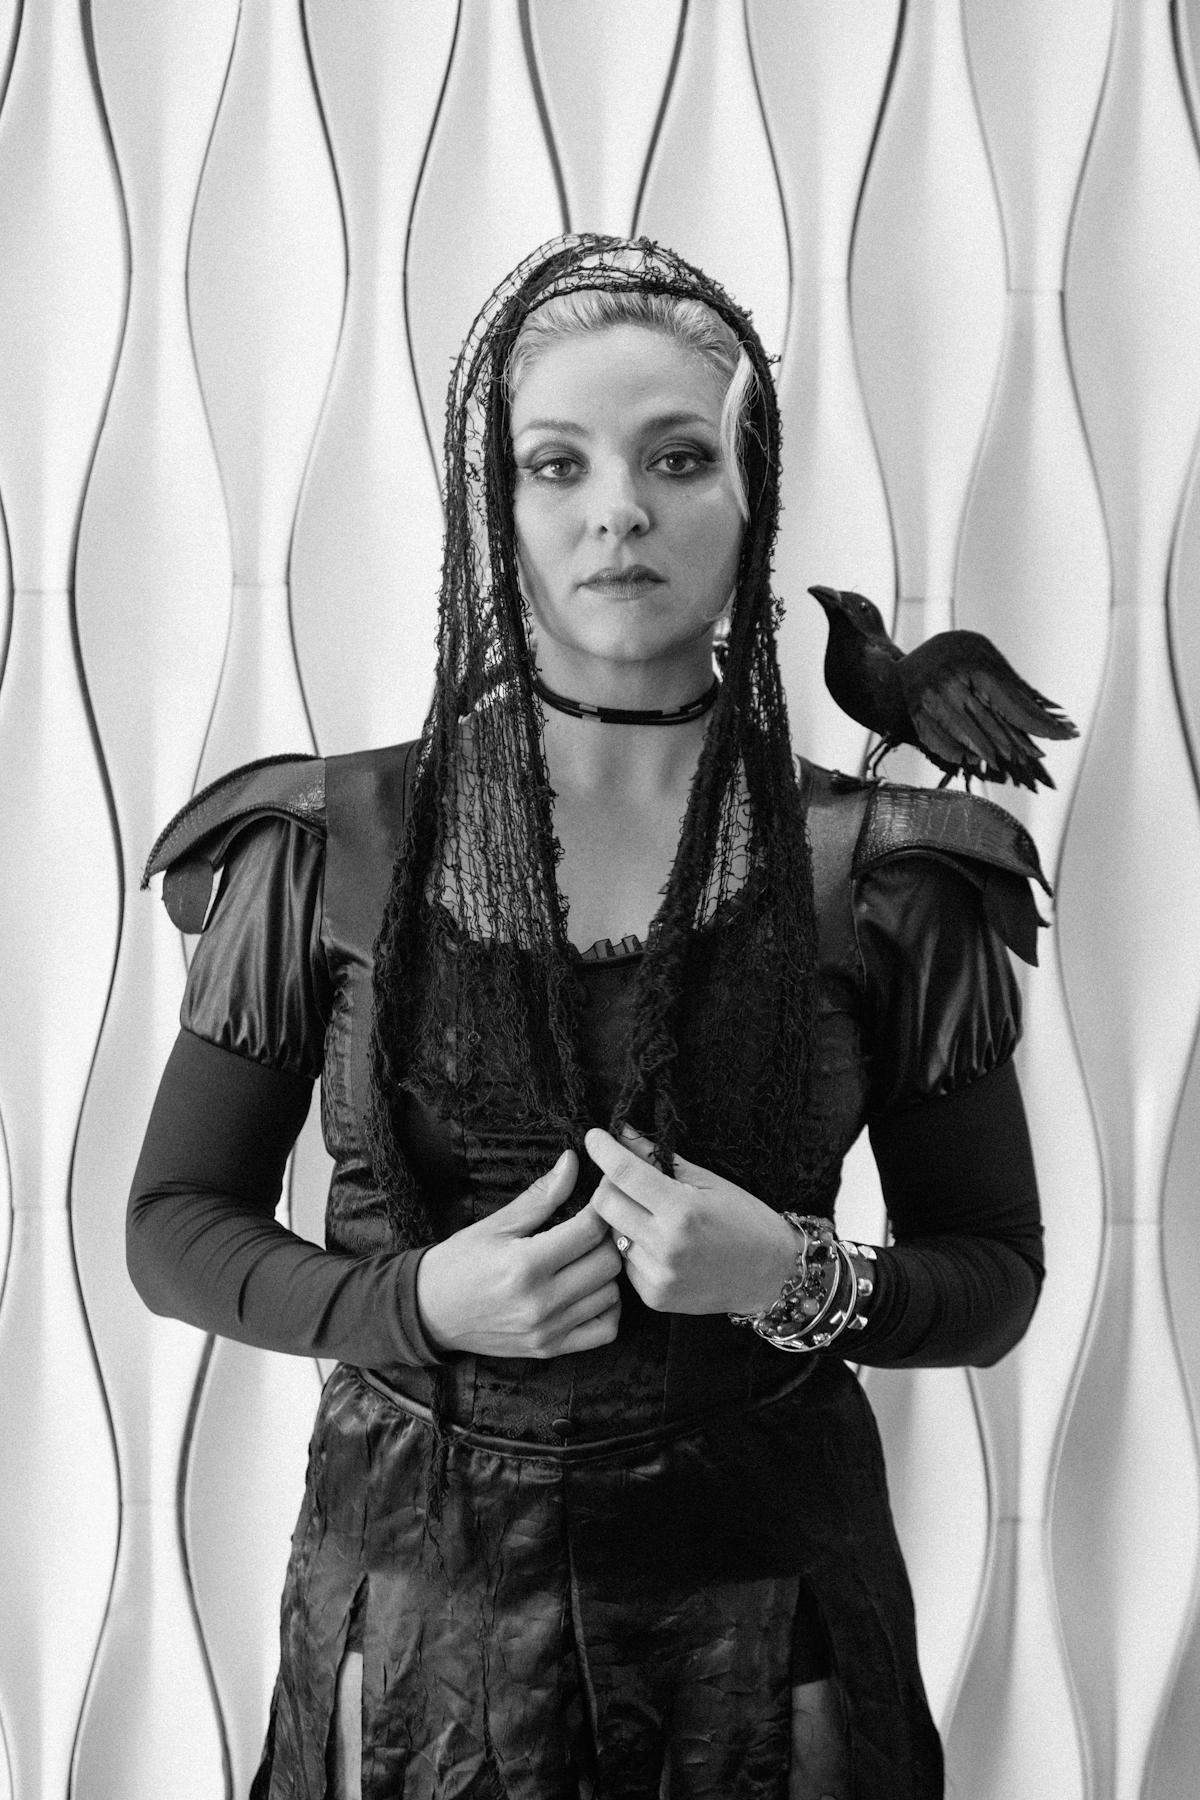 Zoë Poledouris, daughter of Lonesome Dove composer Basil Poledouris. - photo by Yvette Roman